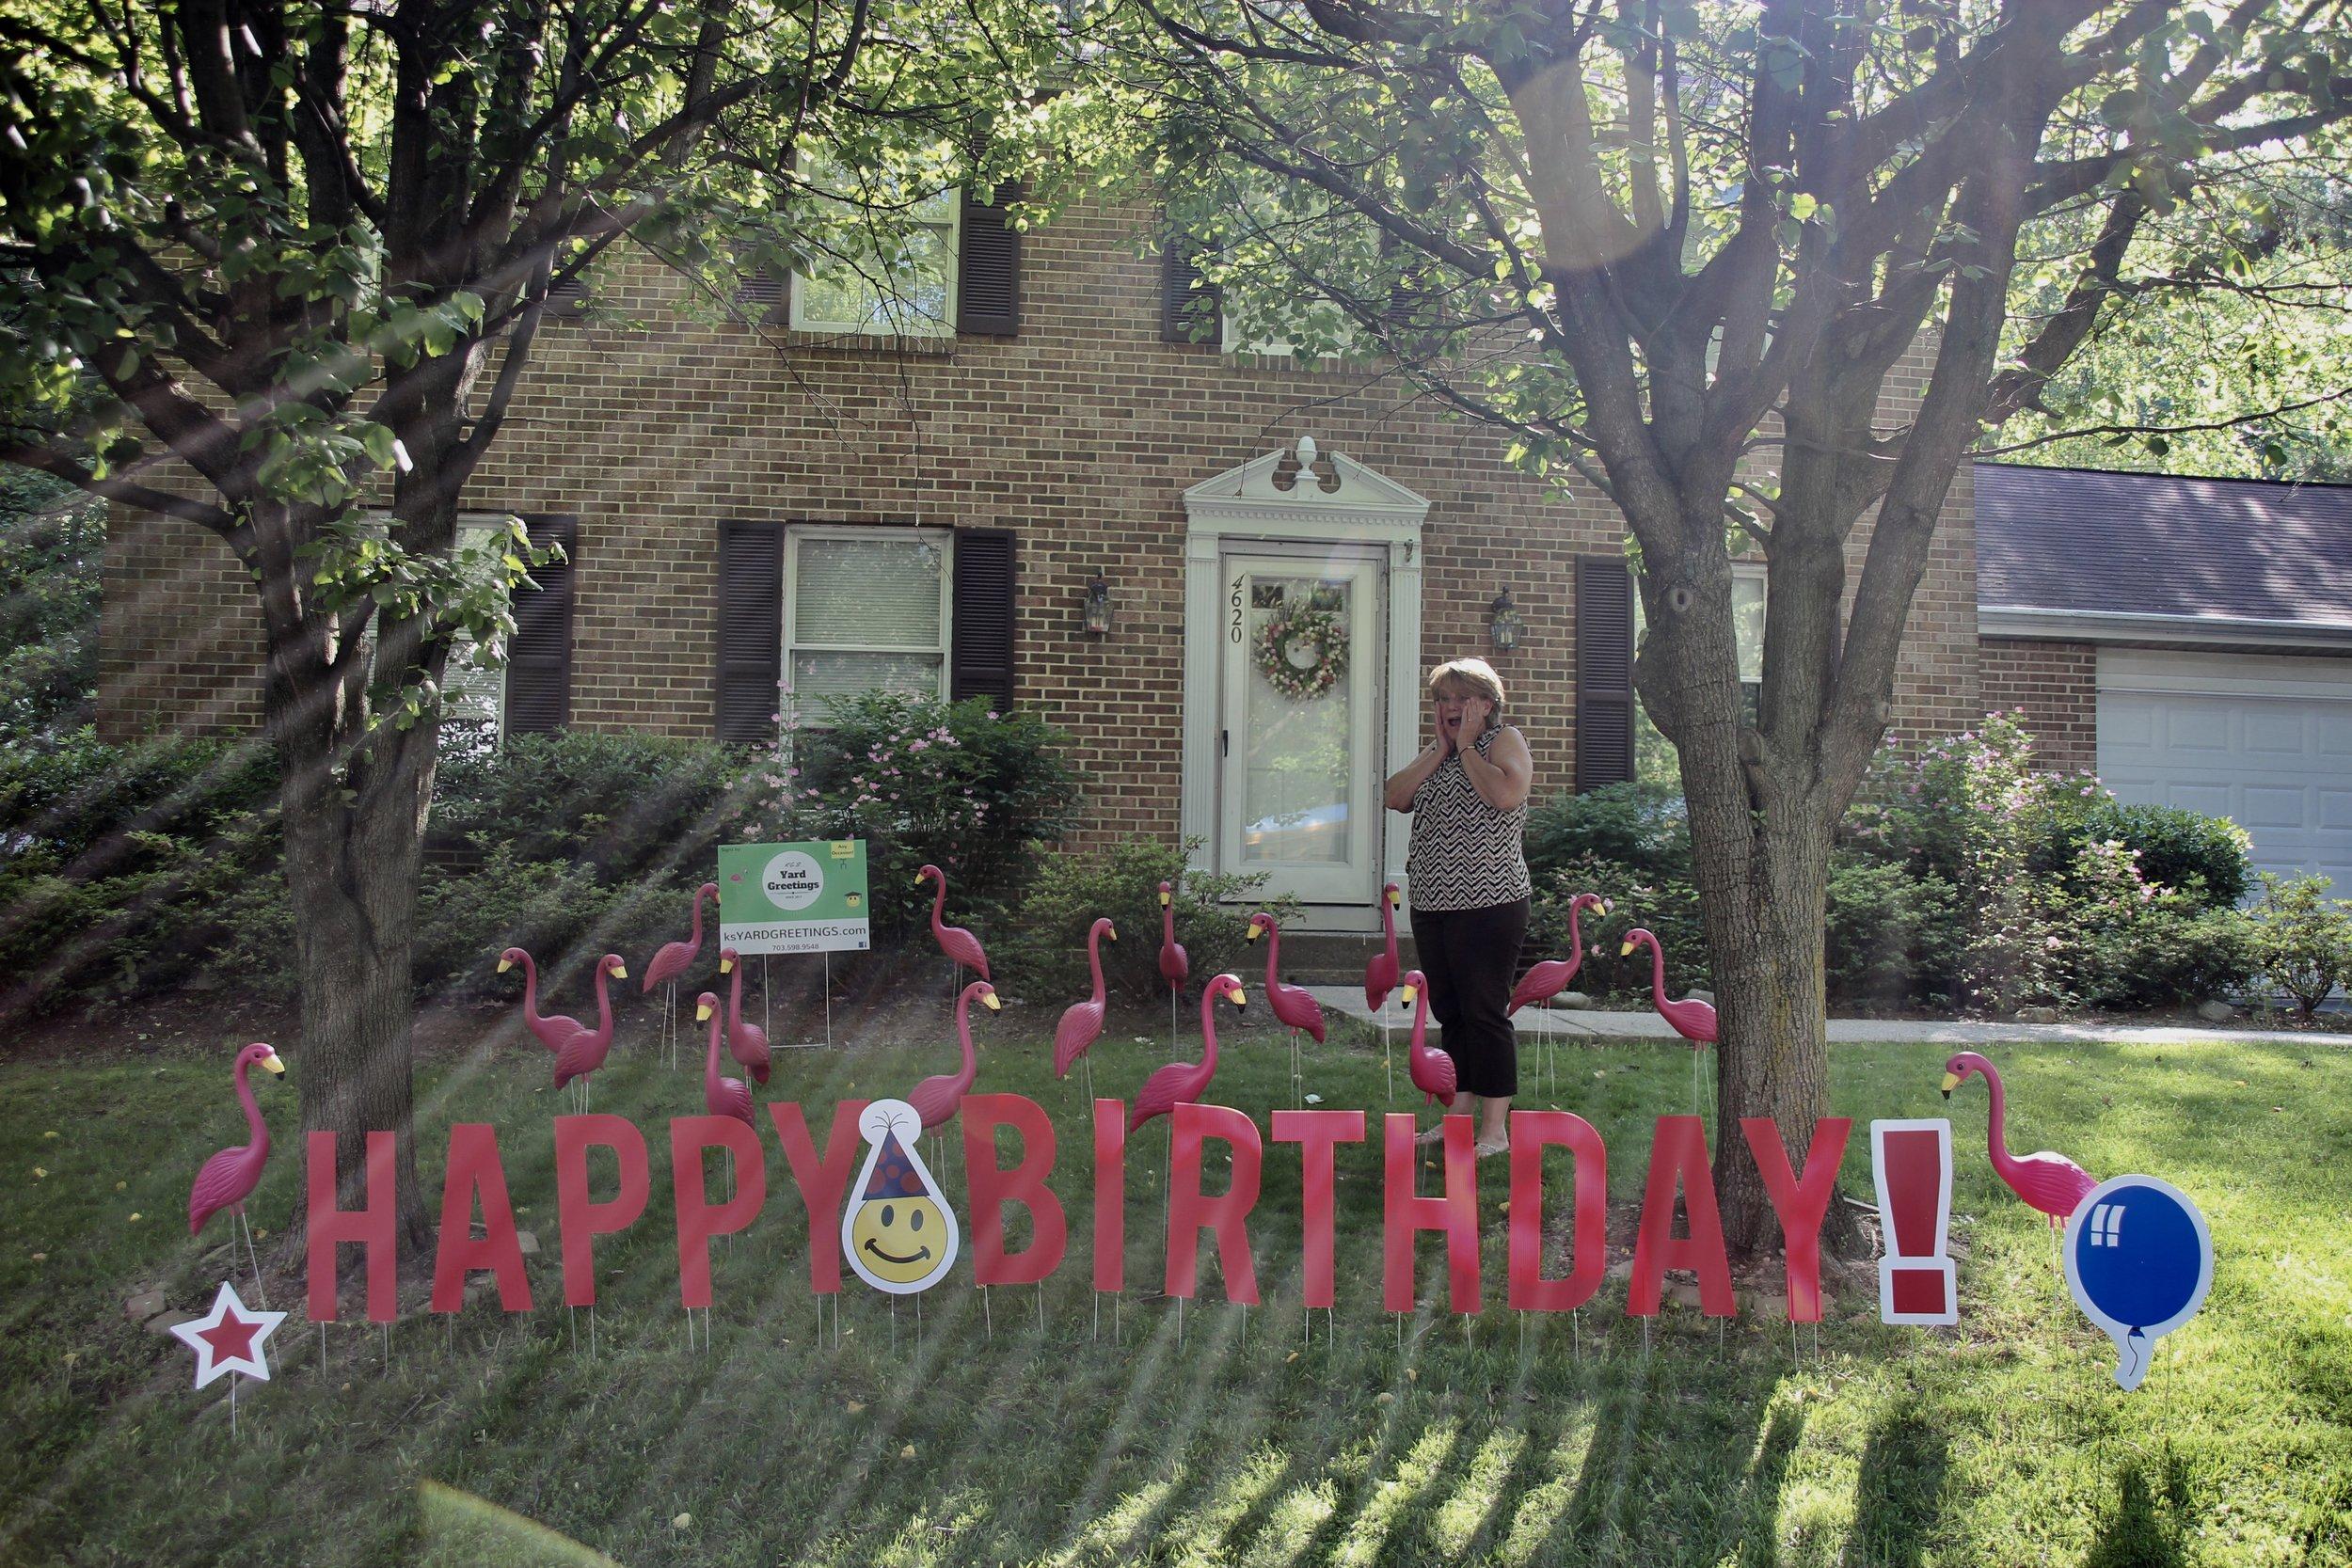 Happy Birthday Lawn Letters